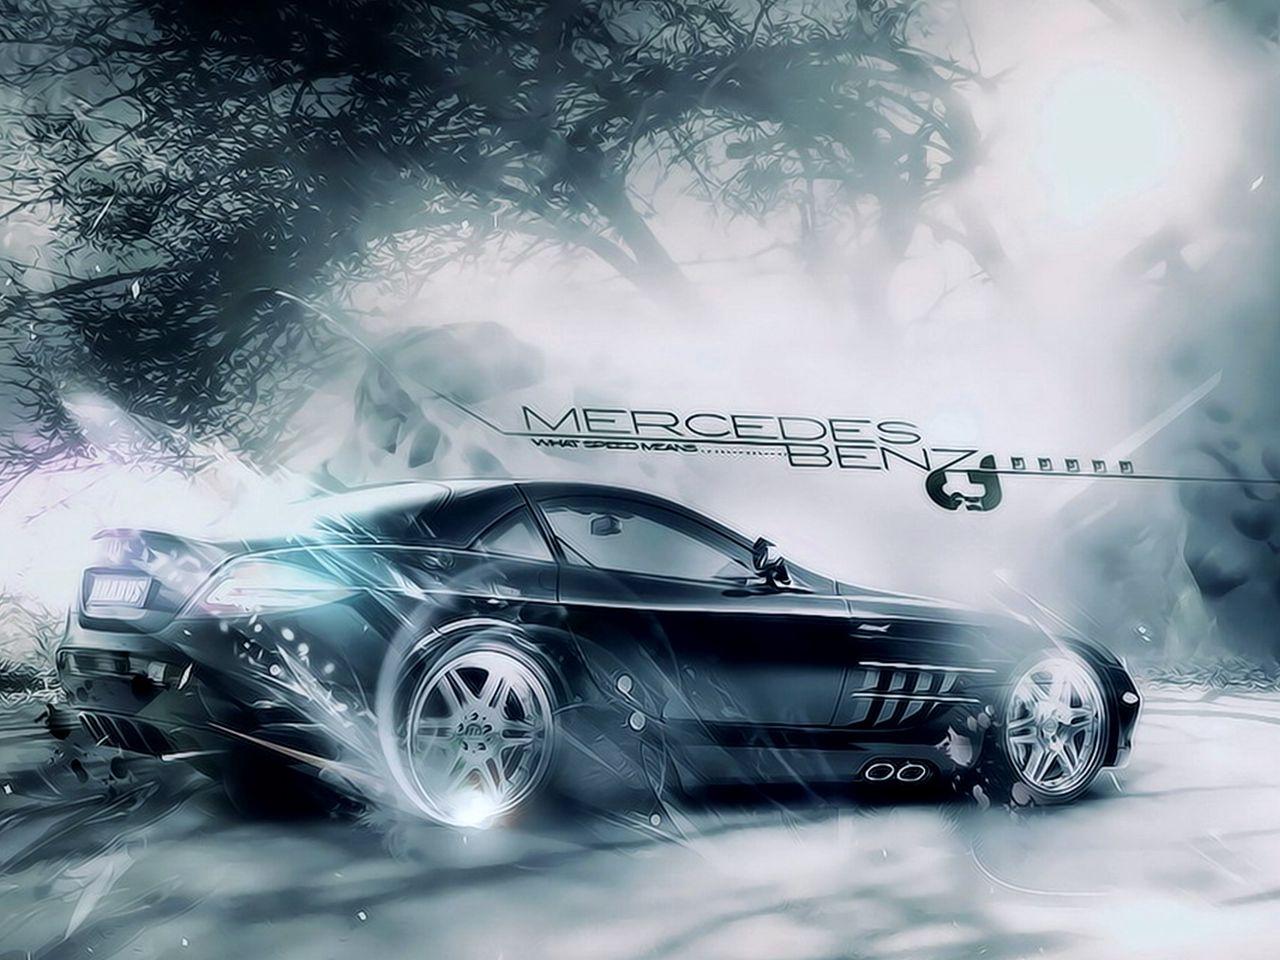 Mercedes Benz Hd Wallpapers Wallpapersafari